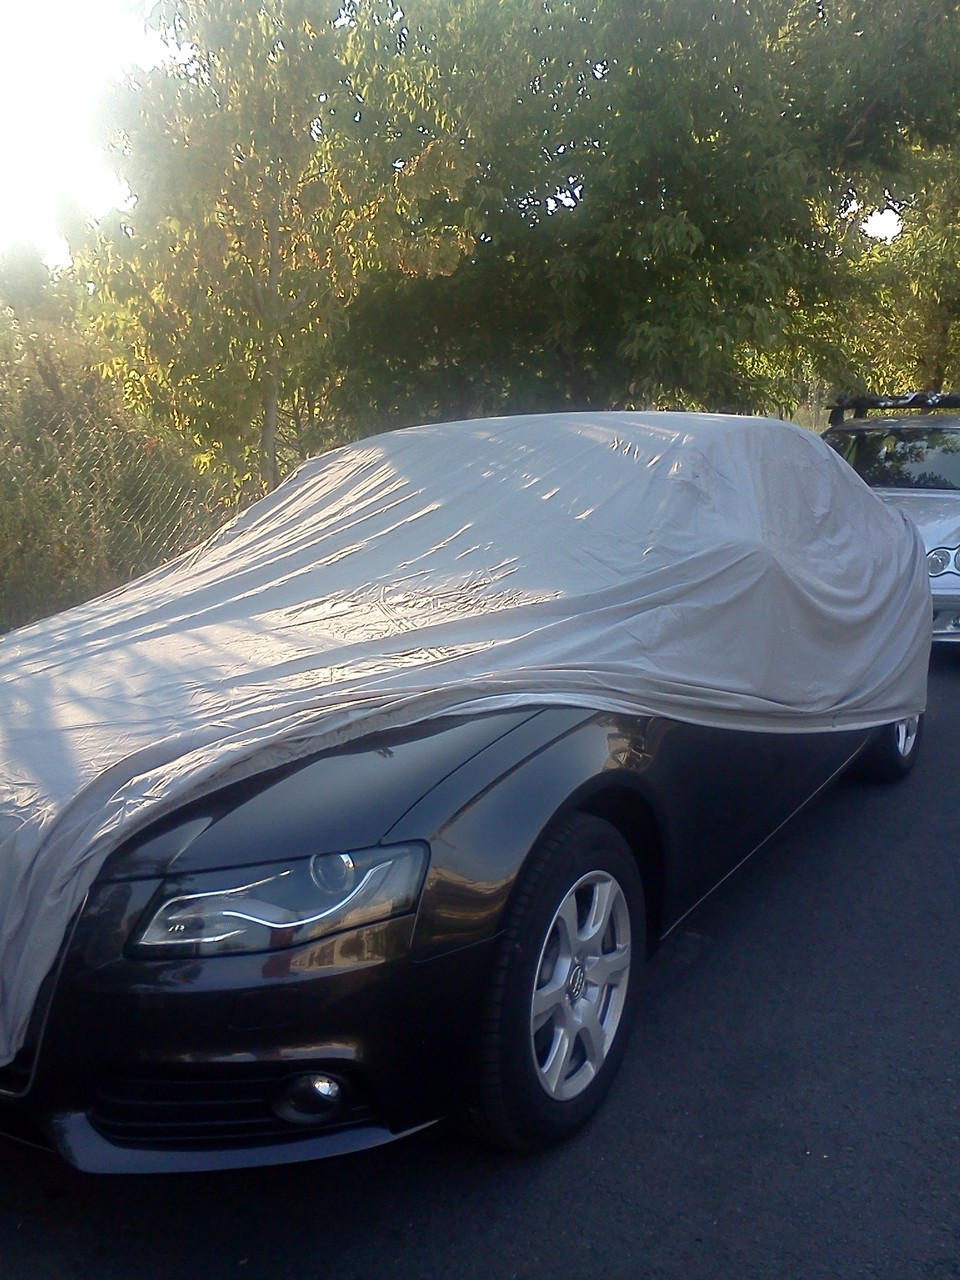 Prelate HUSE AUTO IMPERMEABILE VW Passat B6 B7 B8 Audi A4 A6 A7 A8 Skoda OCTAVIA Superb SCALA KAMIQ